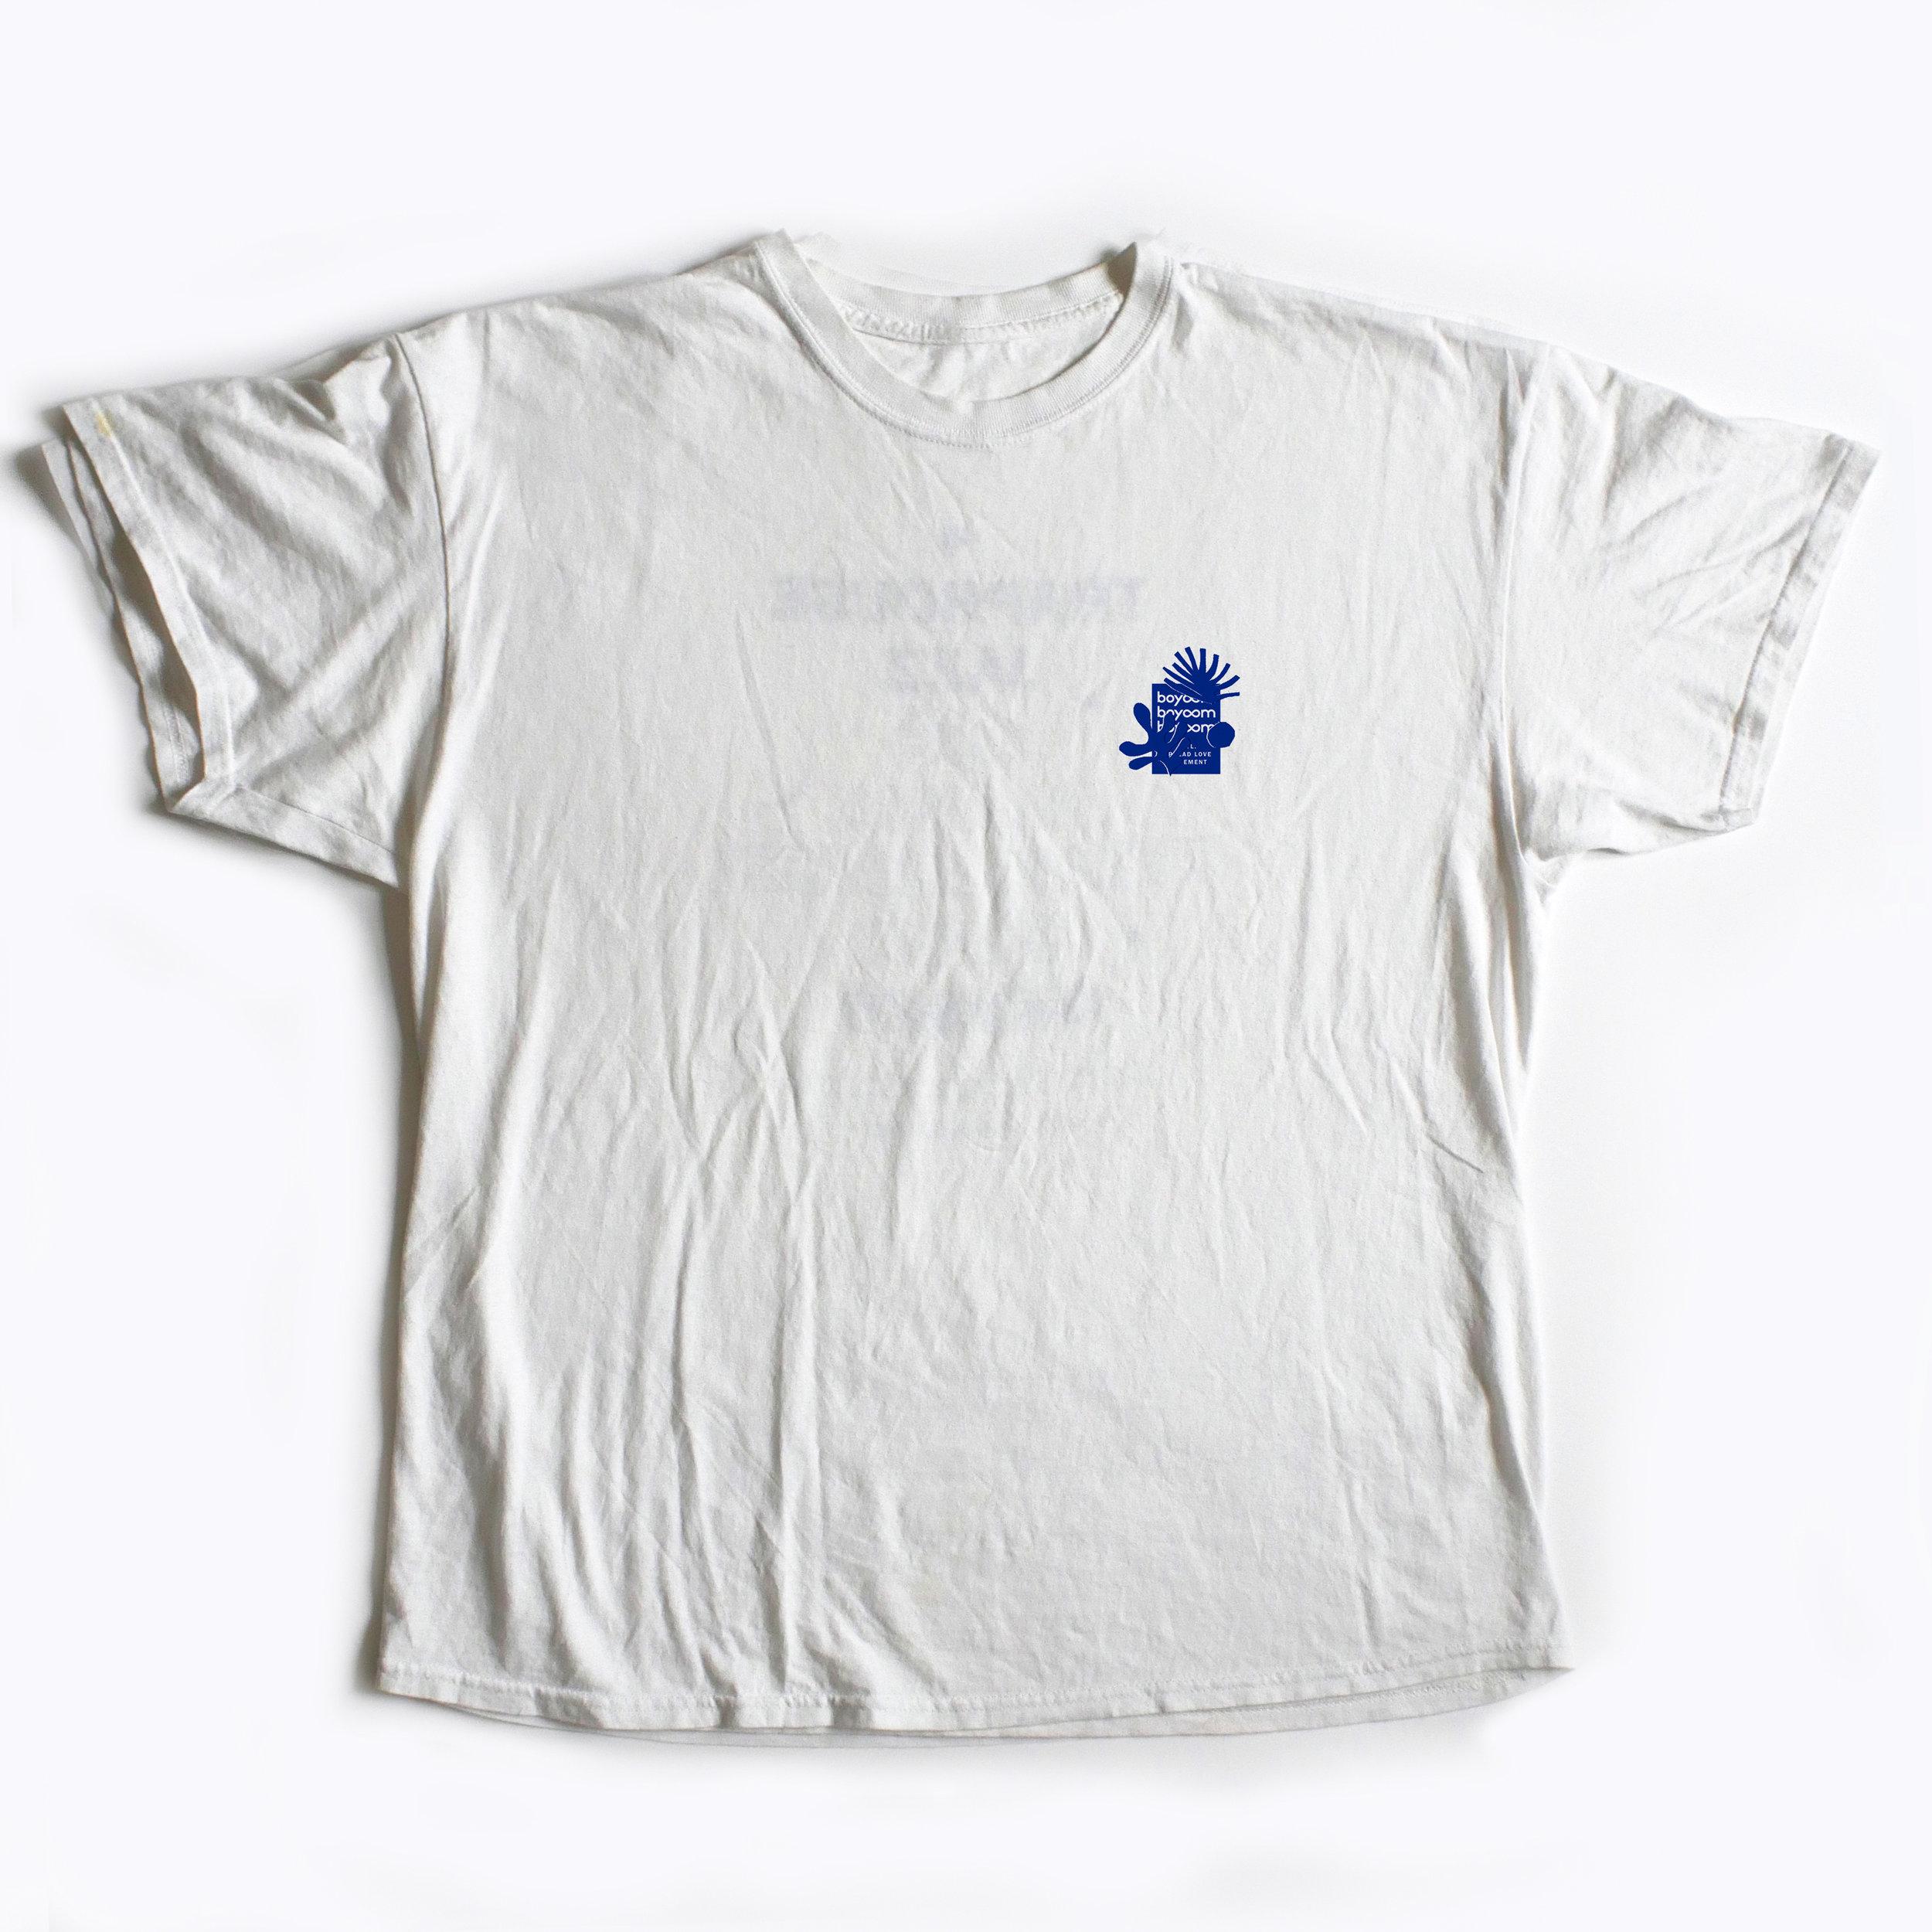 BYC_Shirt_THJ_White_A.jpg